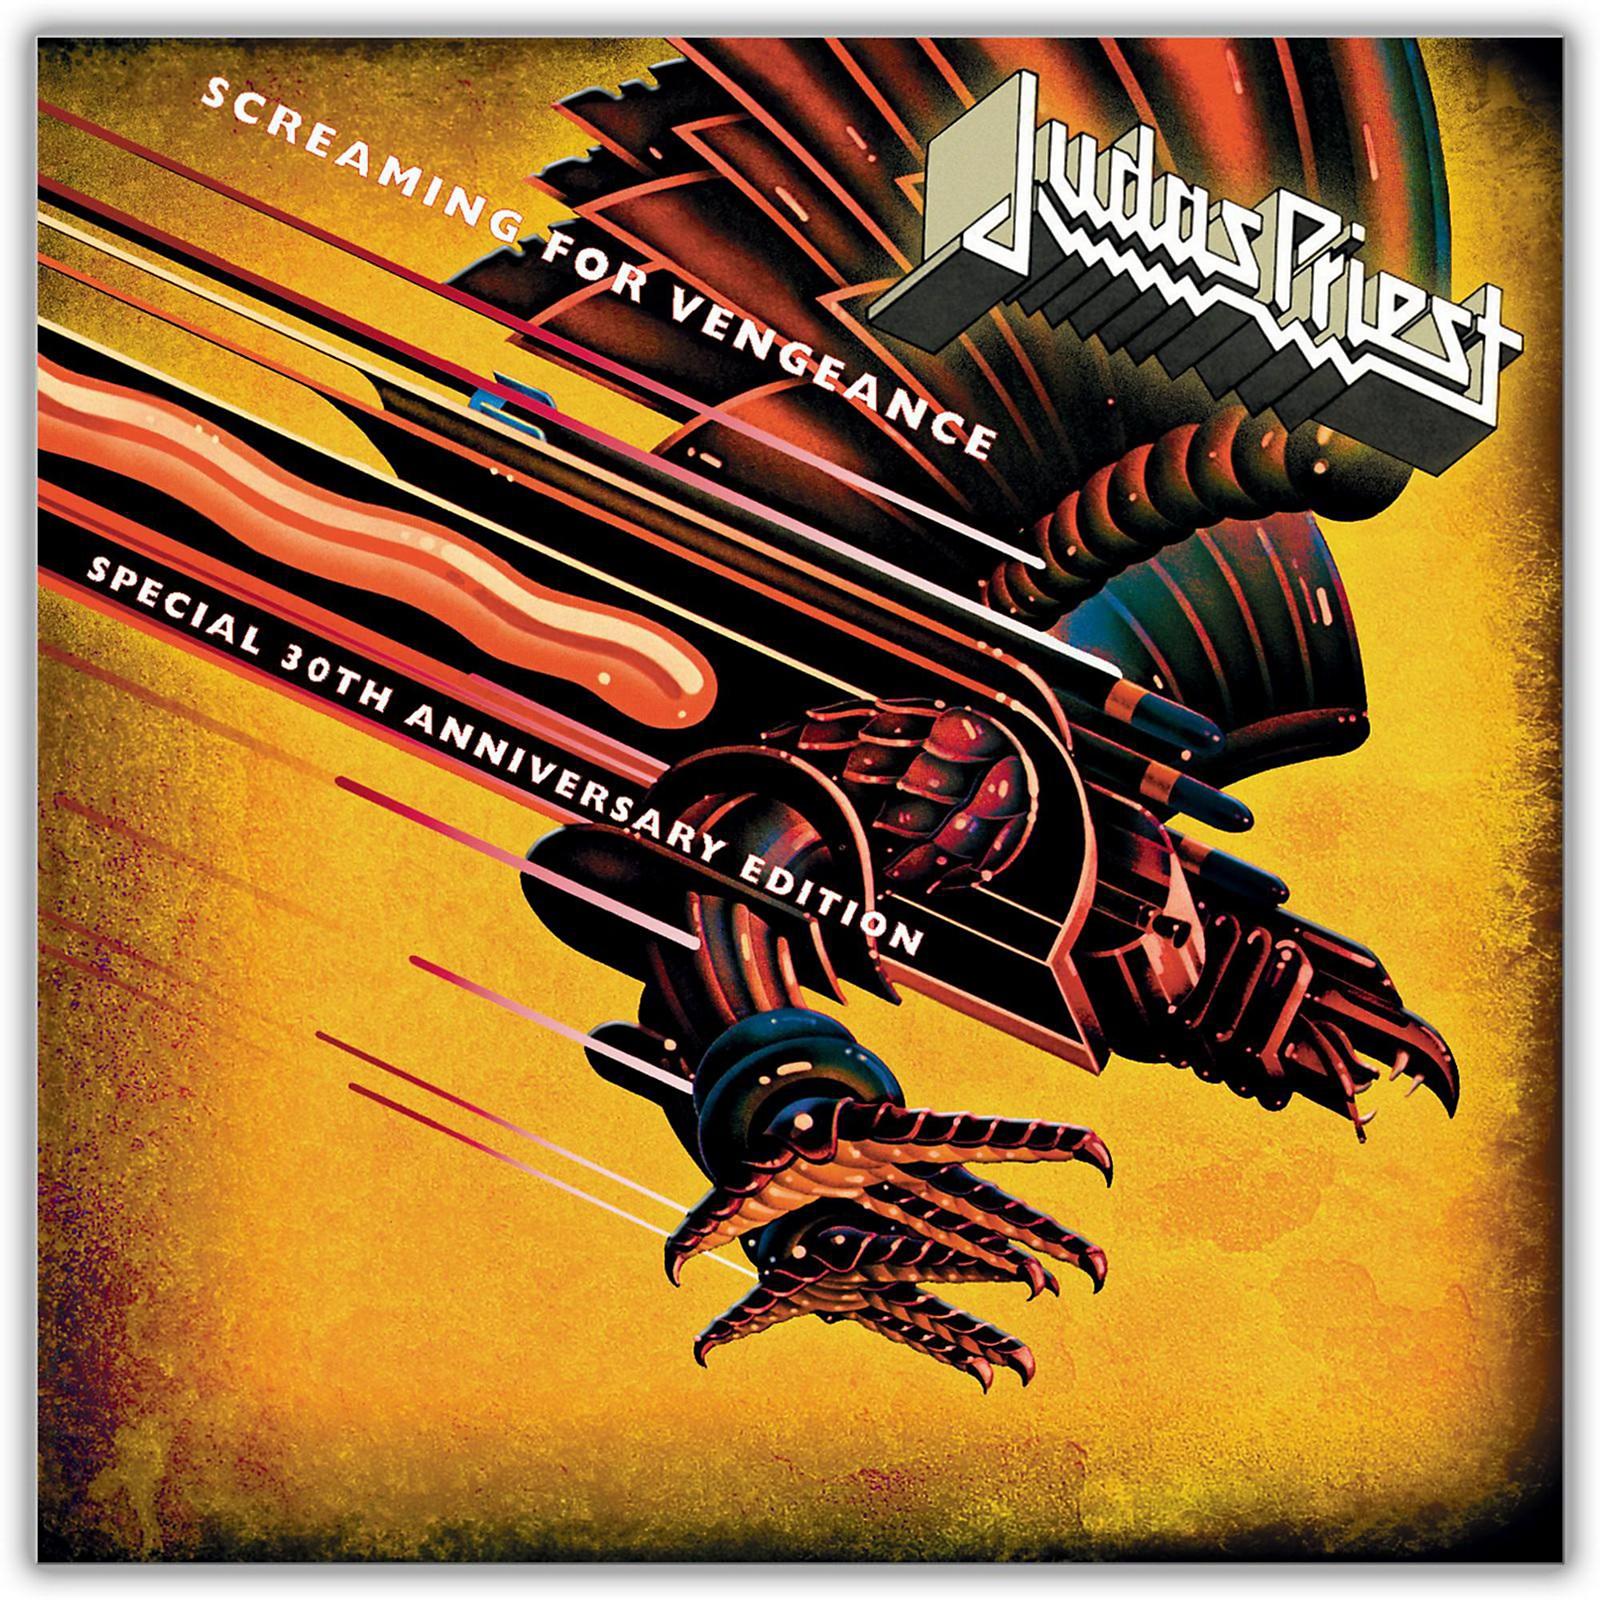 Sony Judas Priest - Screaming for Vengeance (Special 30th Anniversary Edition) Vinyl LP